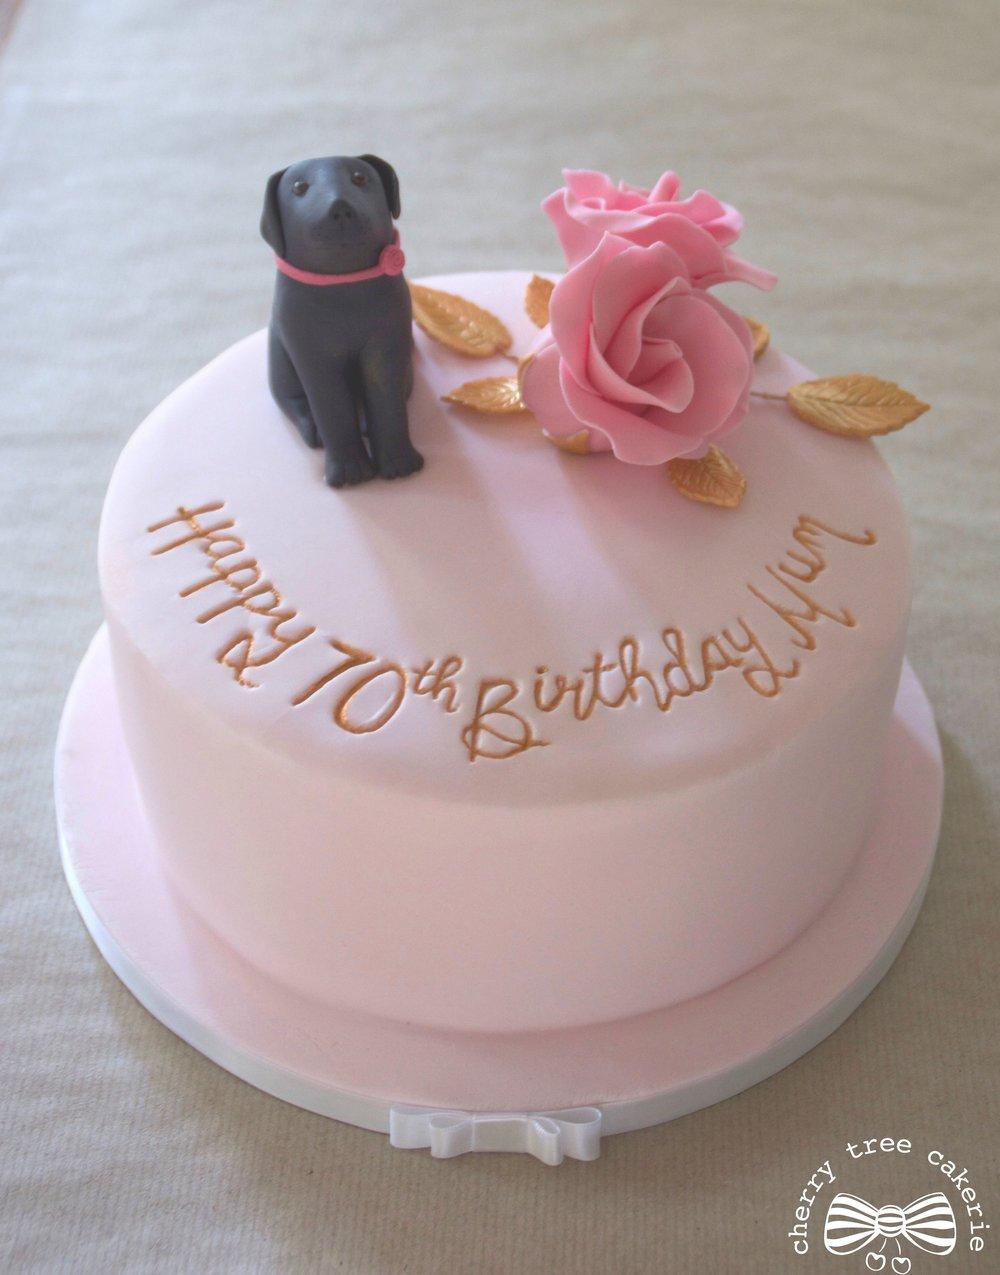 Black-labrador-pink-birthday-cake